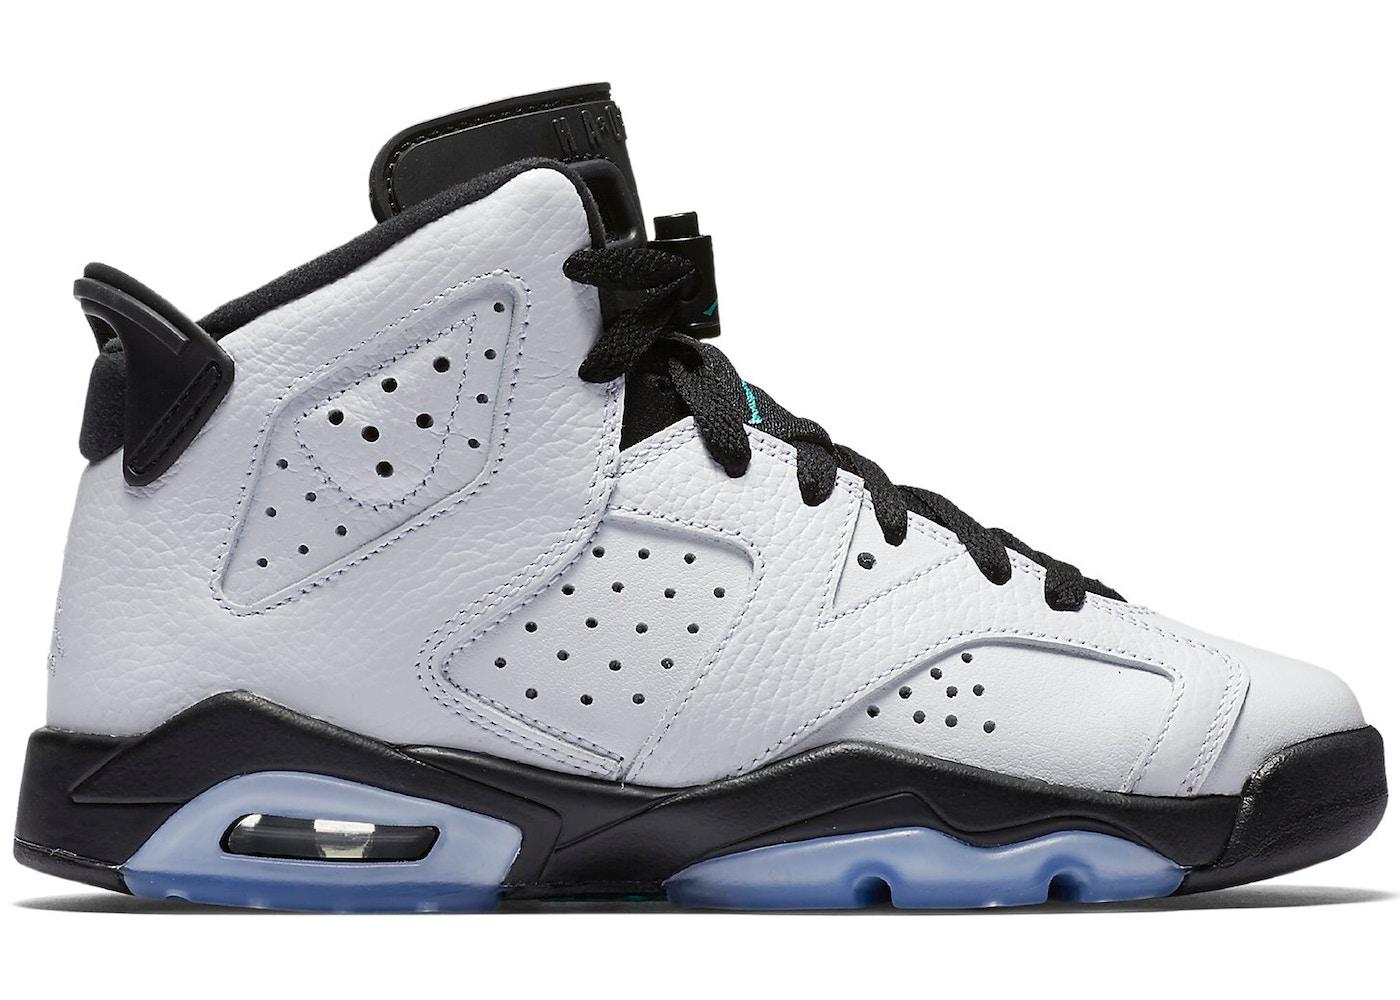 23863a5ddb2 Buy Air Jordan 6 Shoes & Deadstock Sneakers